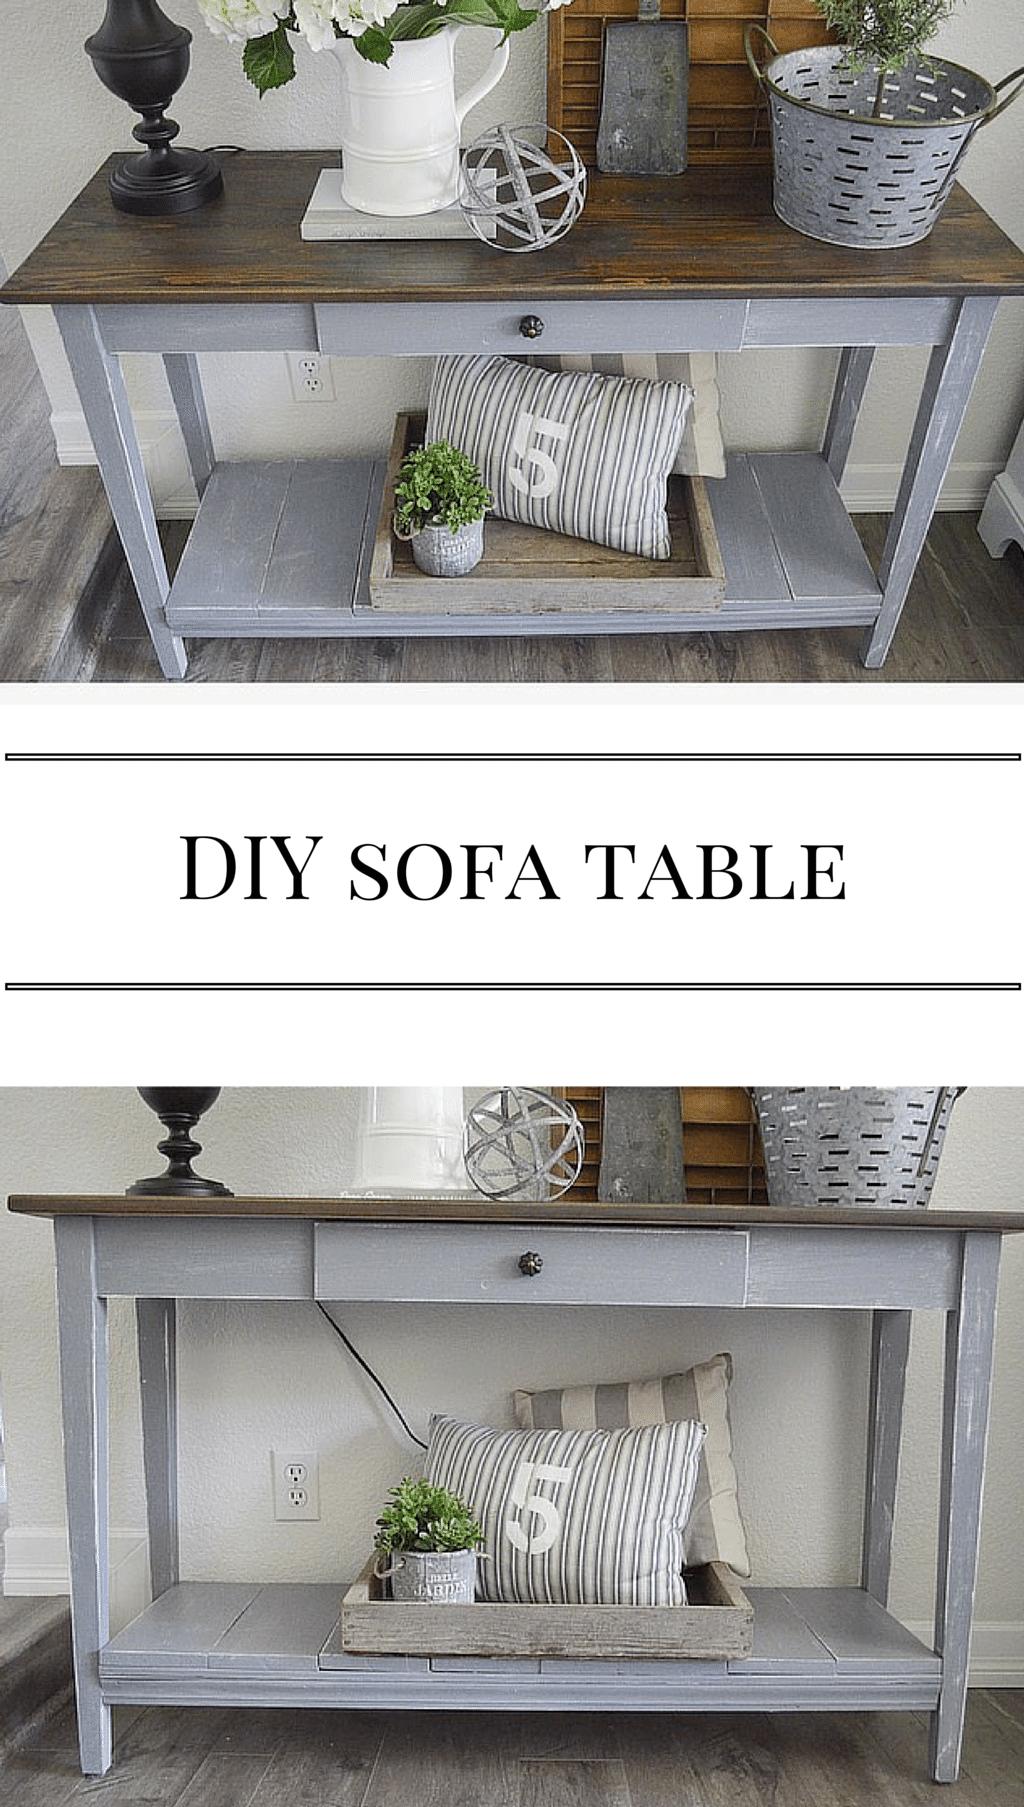 Sofa Table Diy Diy Sofa Table Using Reclaimed Wood The Easiest Ever My City